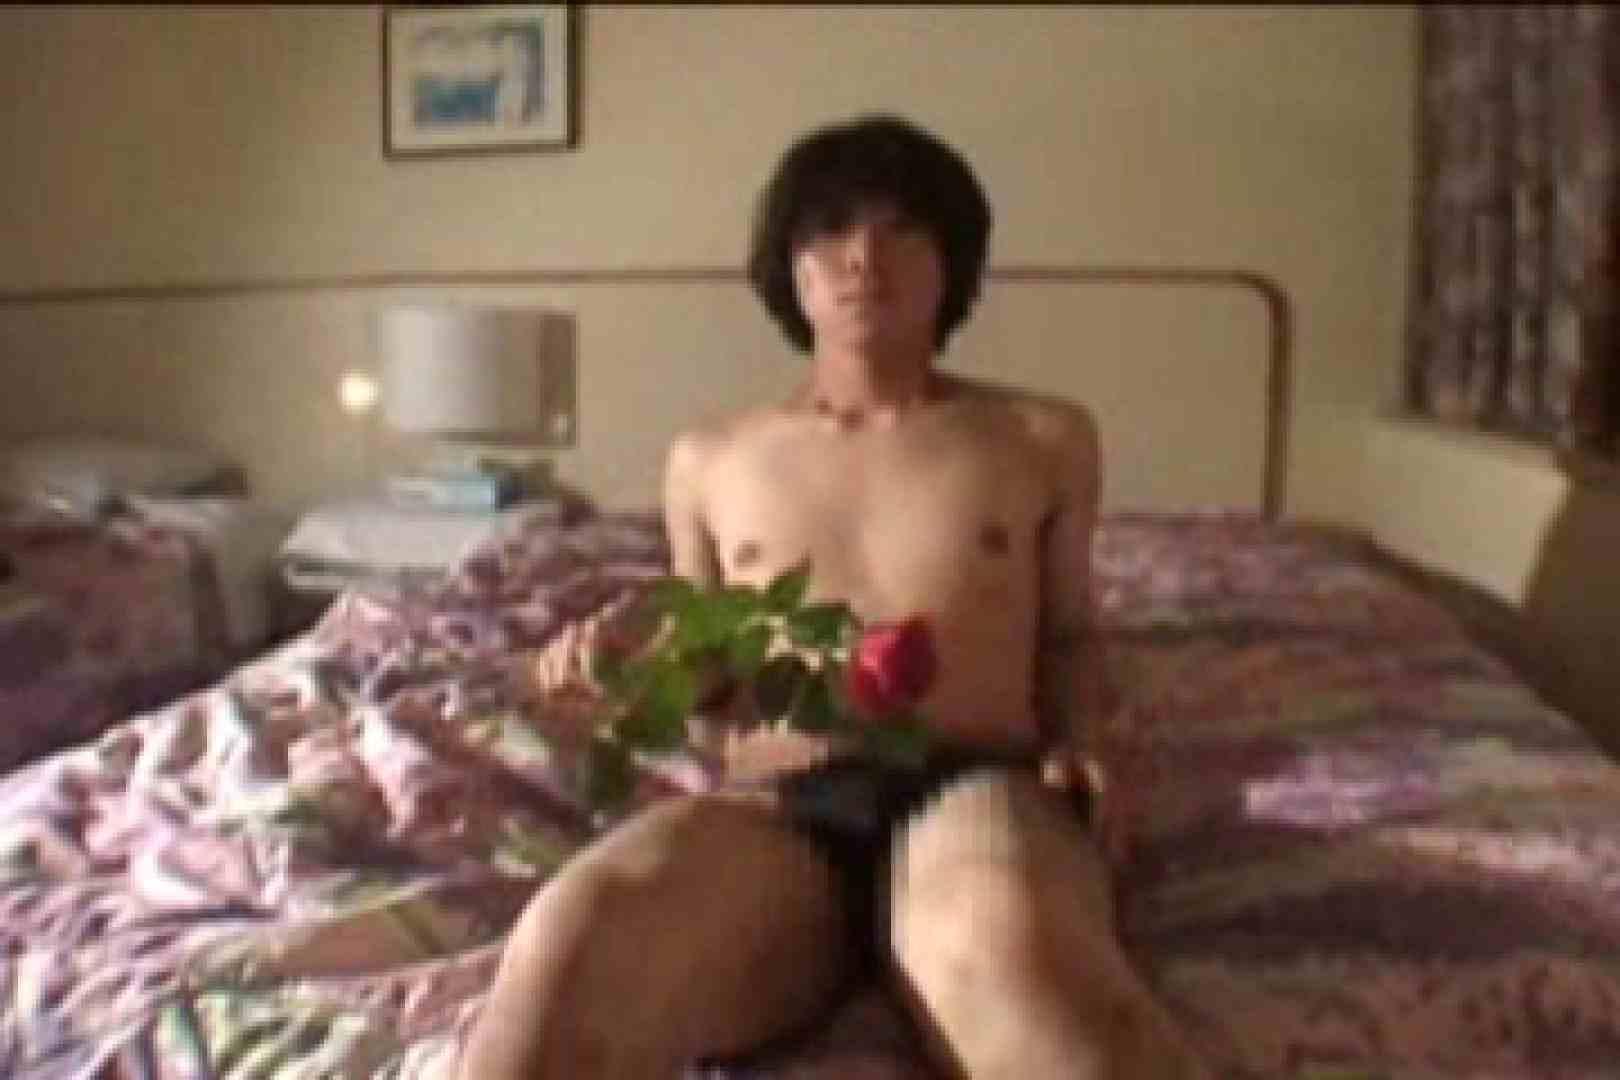 Scoop ! ! 発情した男の生堀り・ガン掘りSEX stage.1 男祭り ちんぽ画像 68枚 22